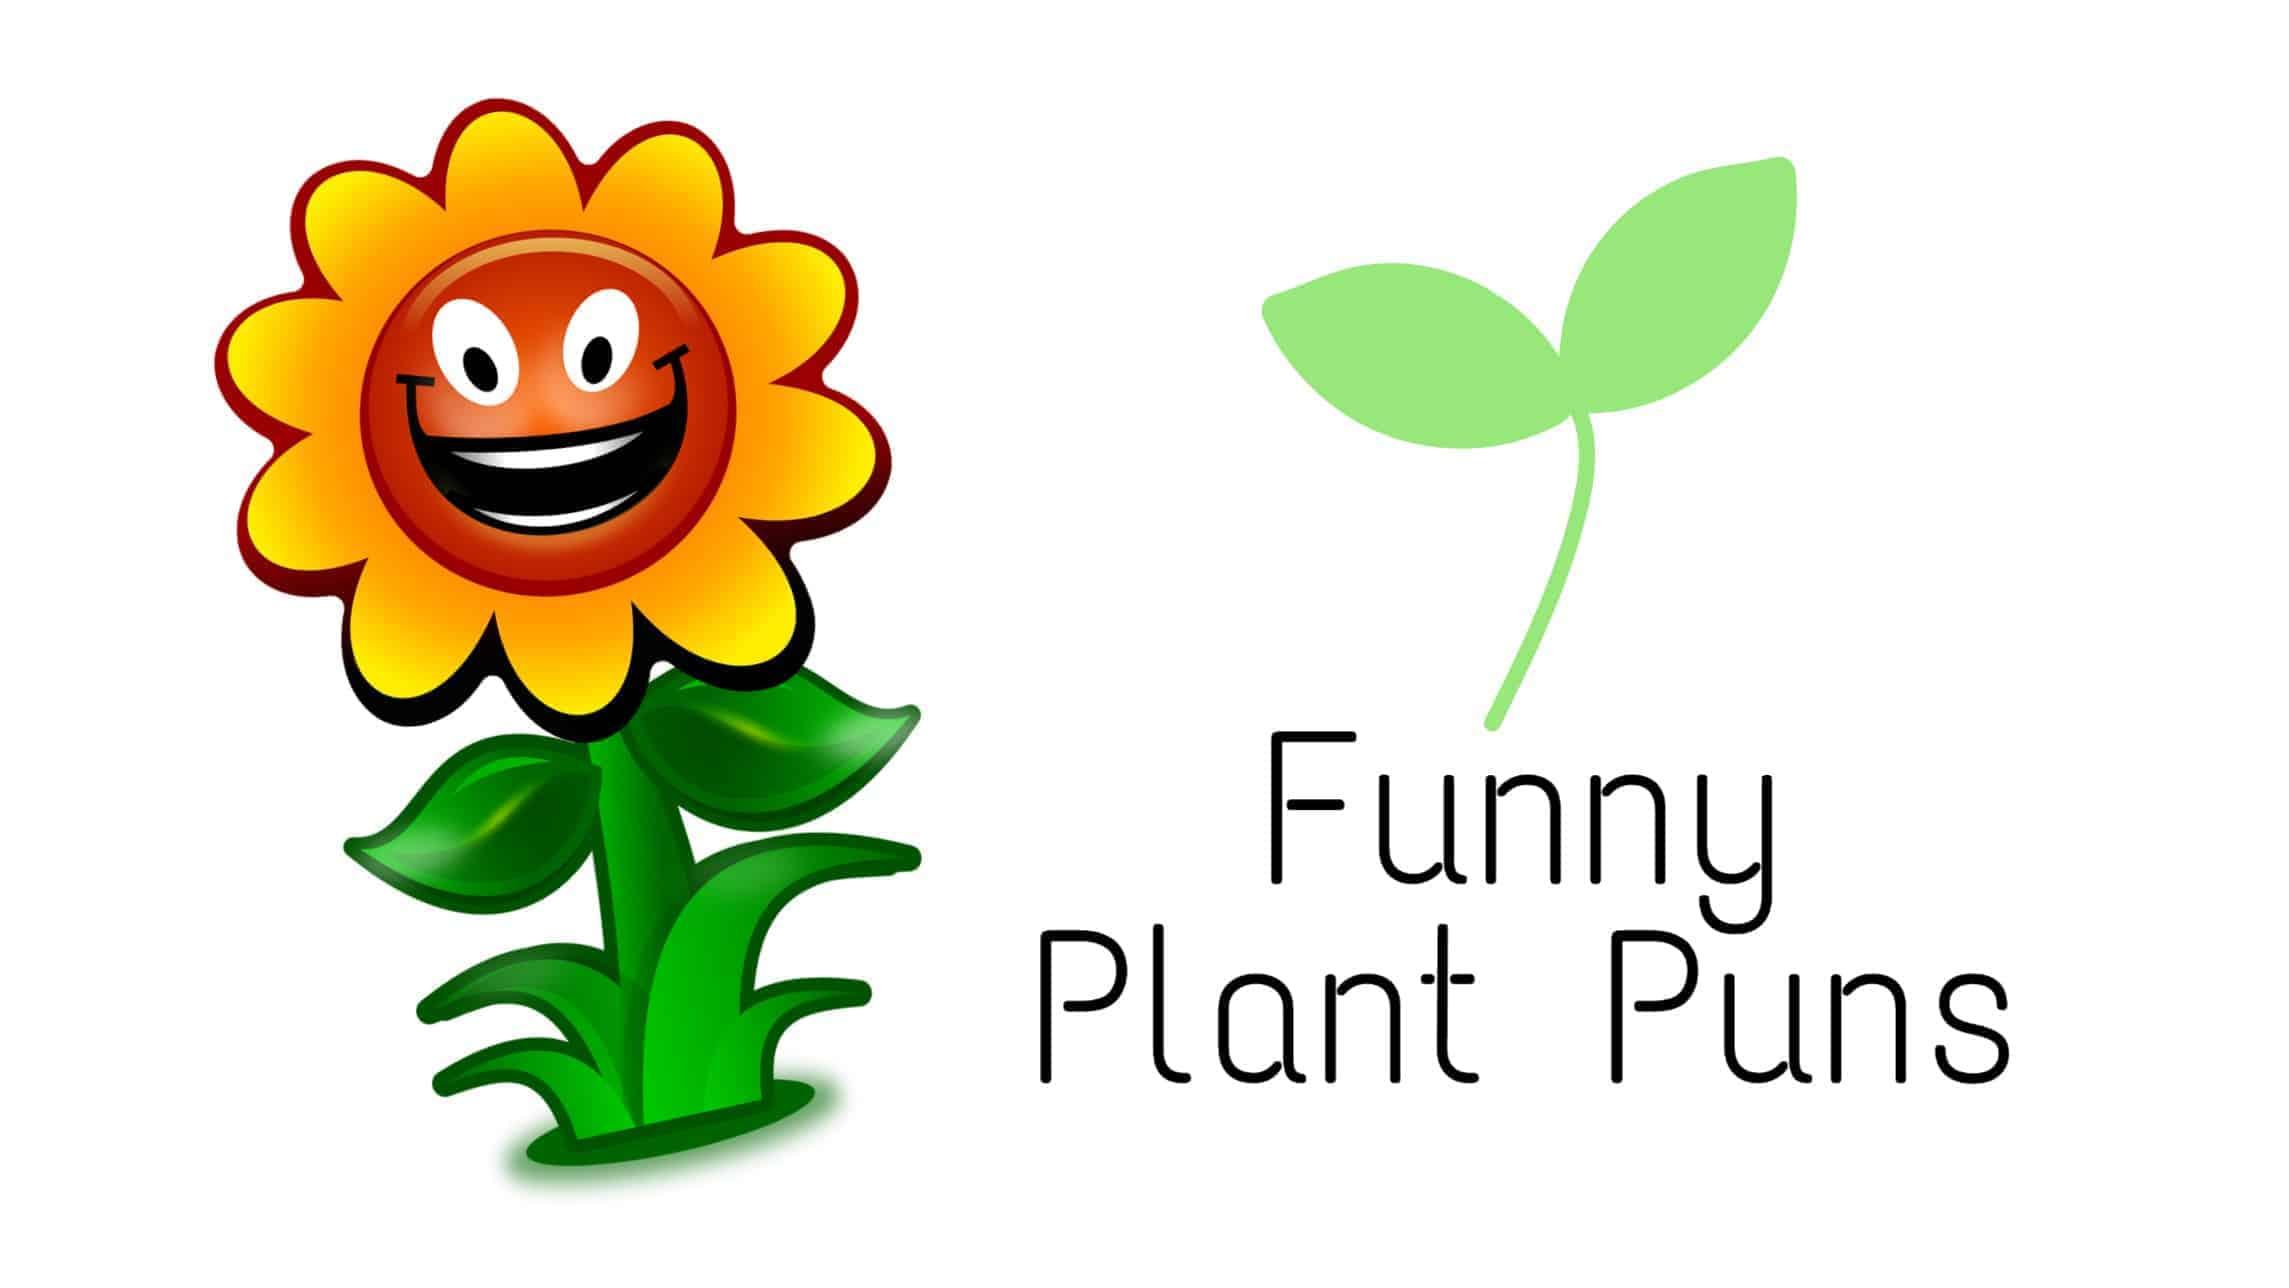 funny plant puns